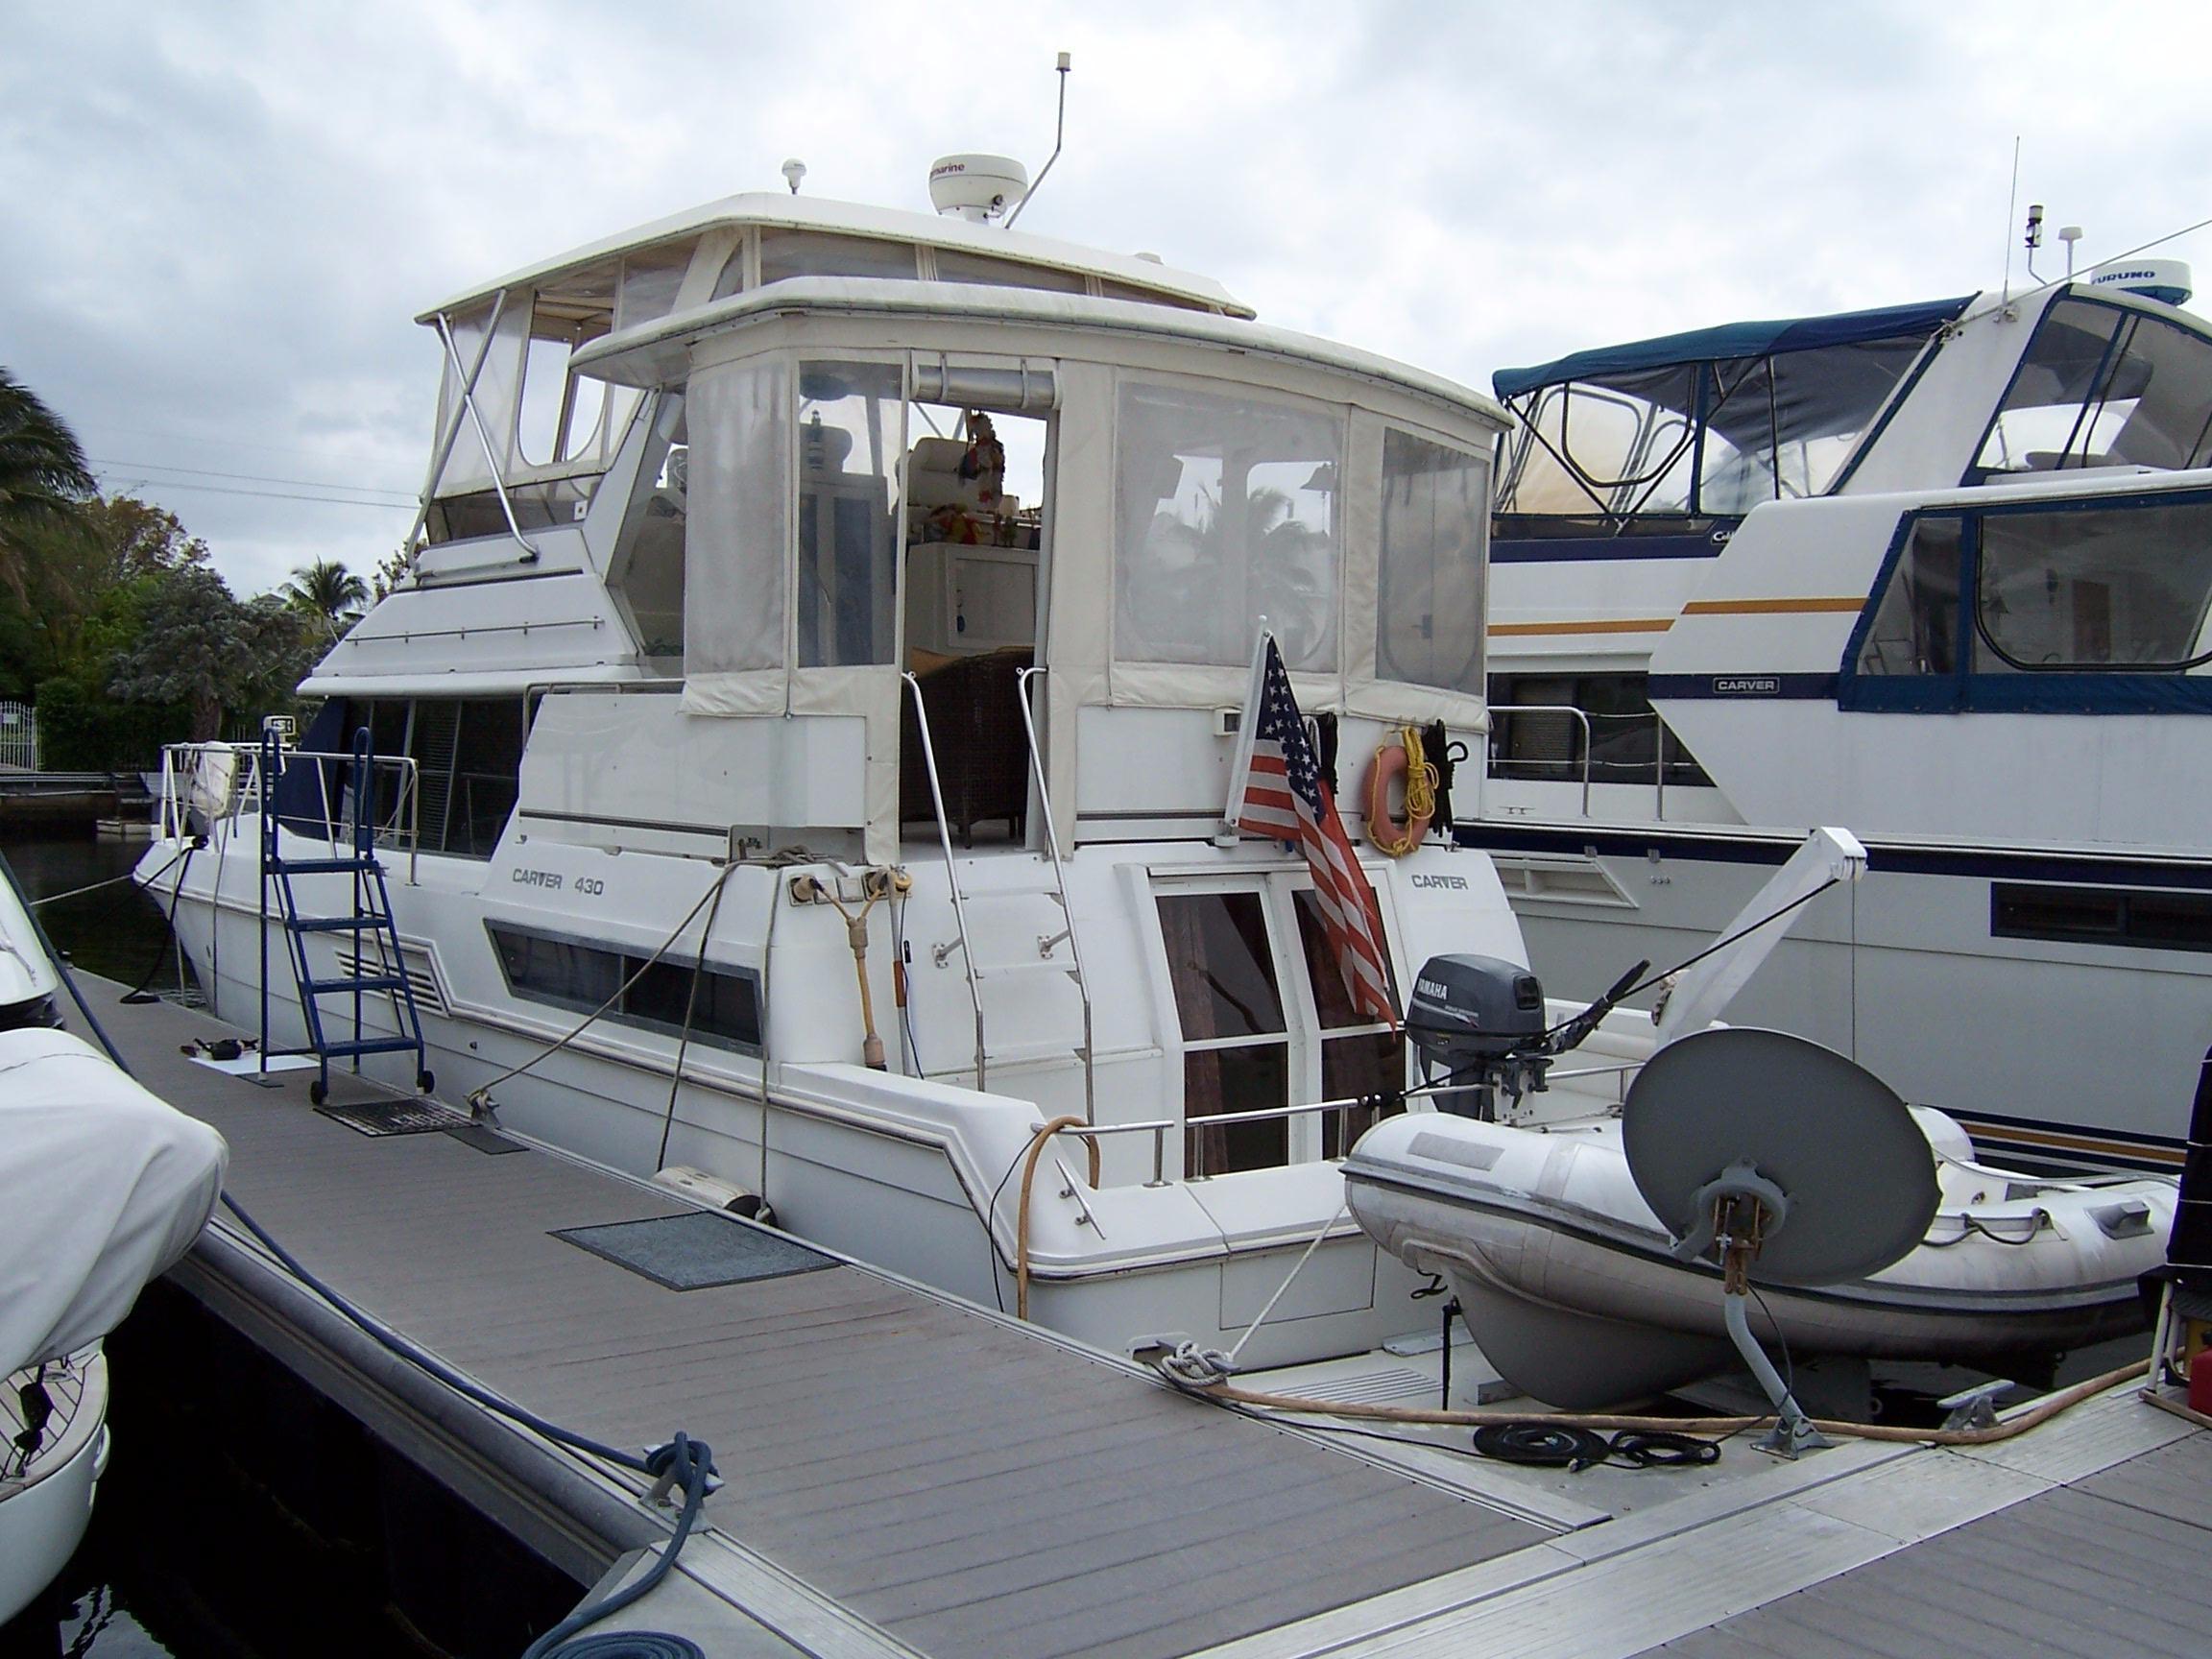 43' Carver 1996 430 Cockpit Motor Yacht